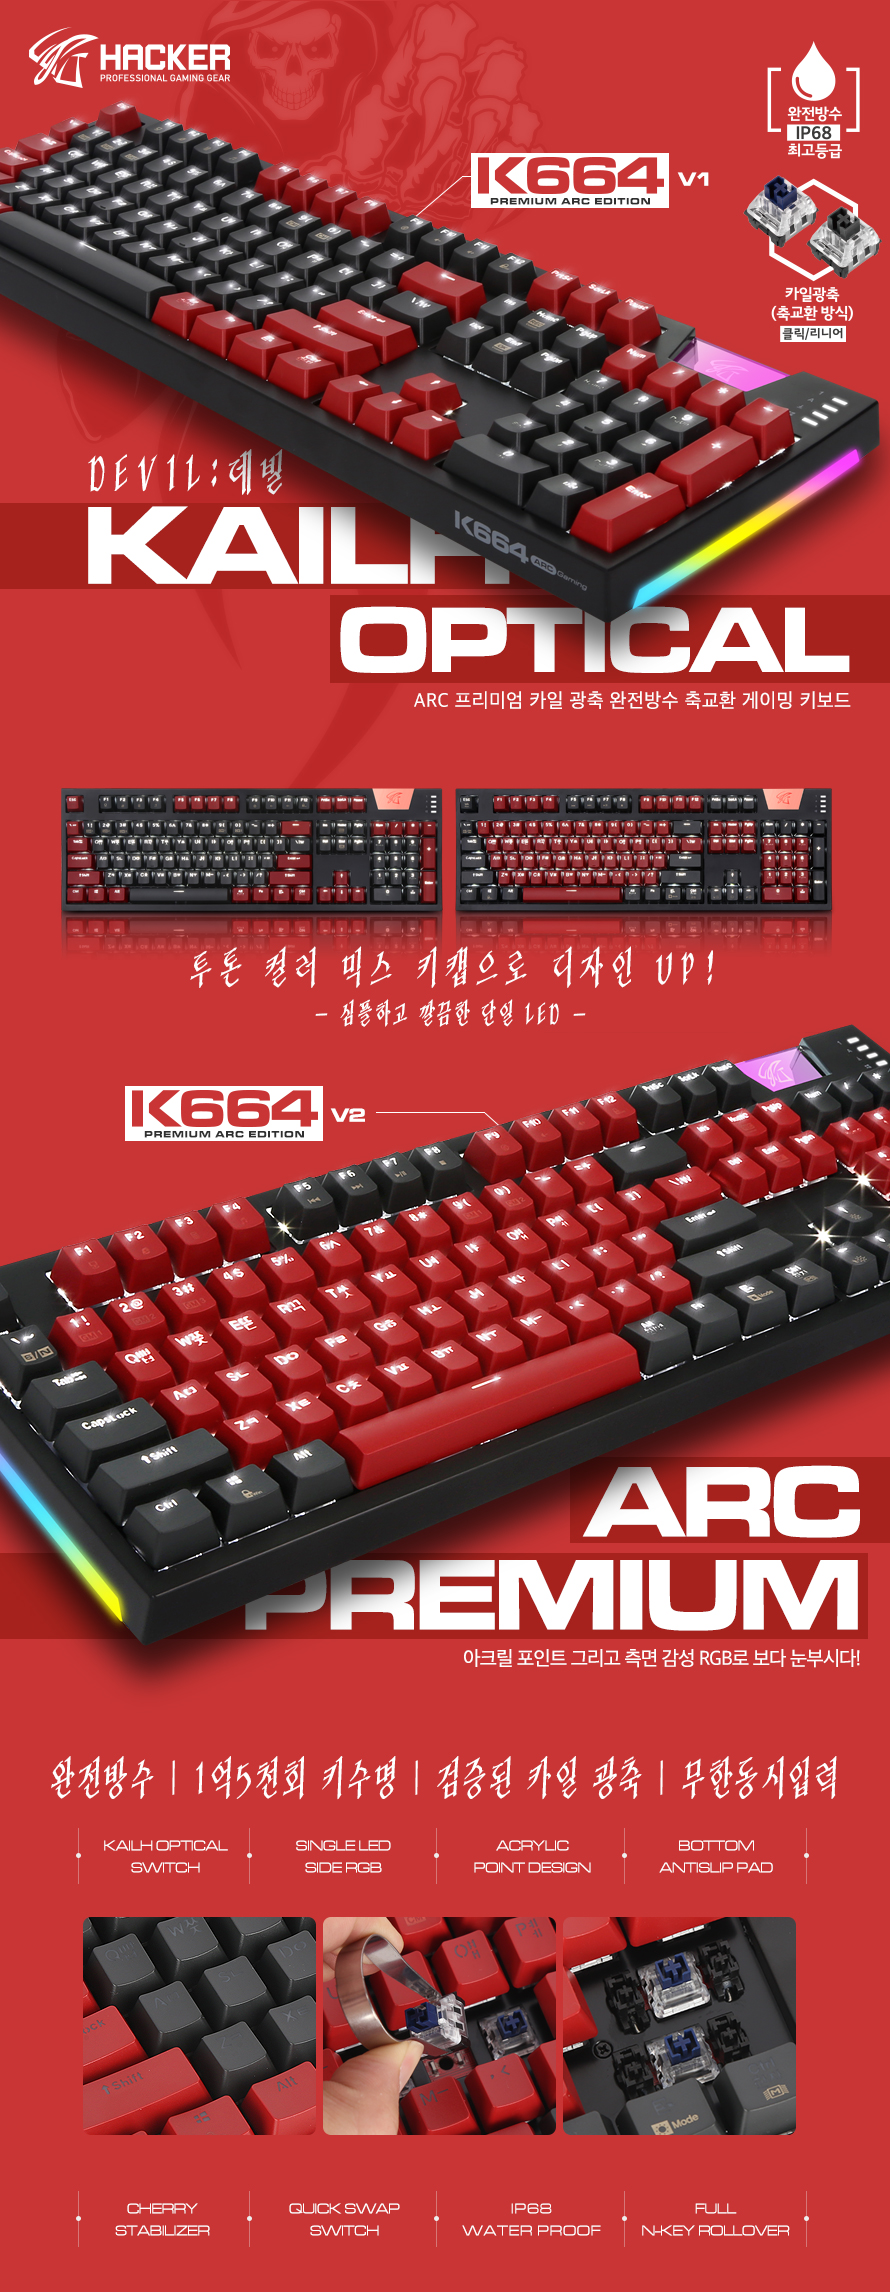 ABKO HACKER K664 ARC 프리미엄 카일 광축 완전방수 LED 데빌(V2, 리니어)